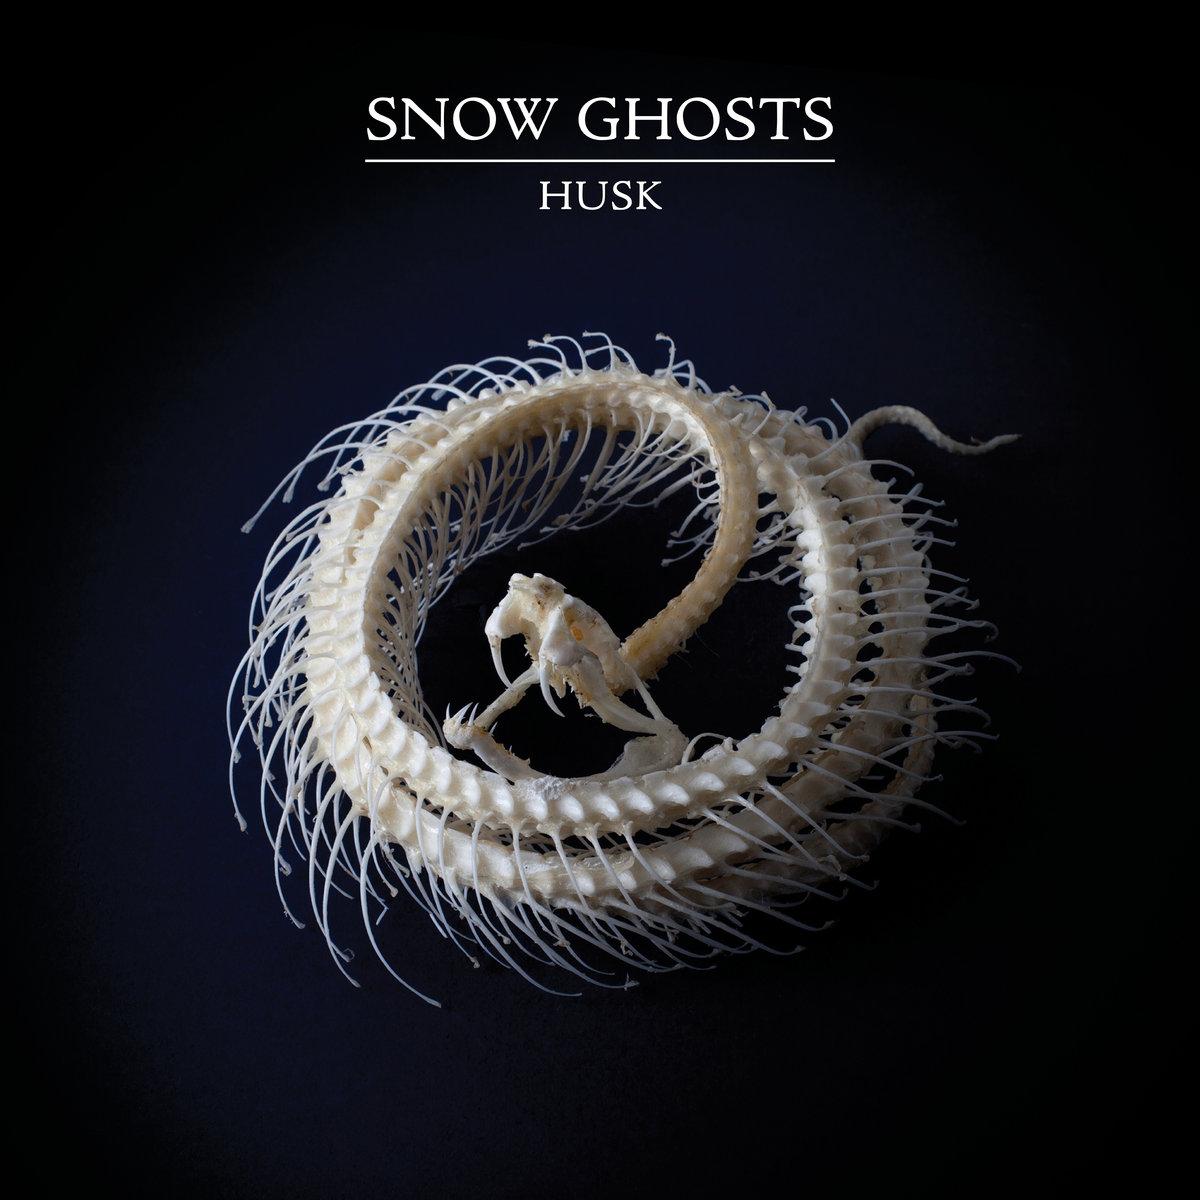 47. Snow Ghosts - Husk